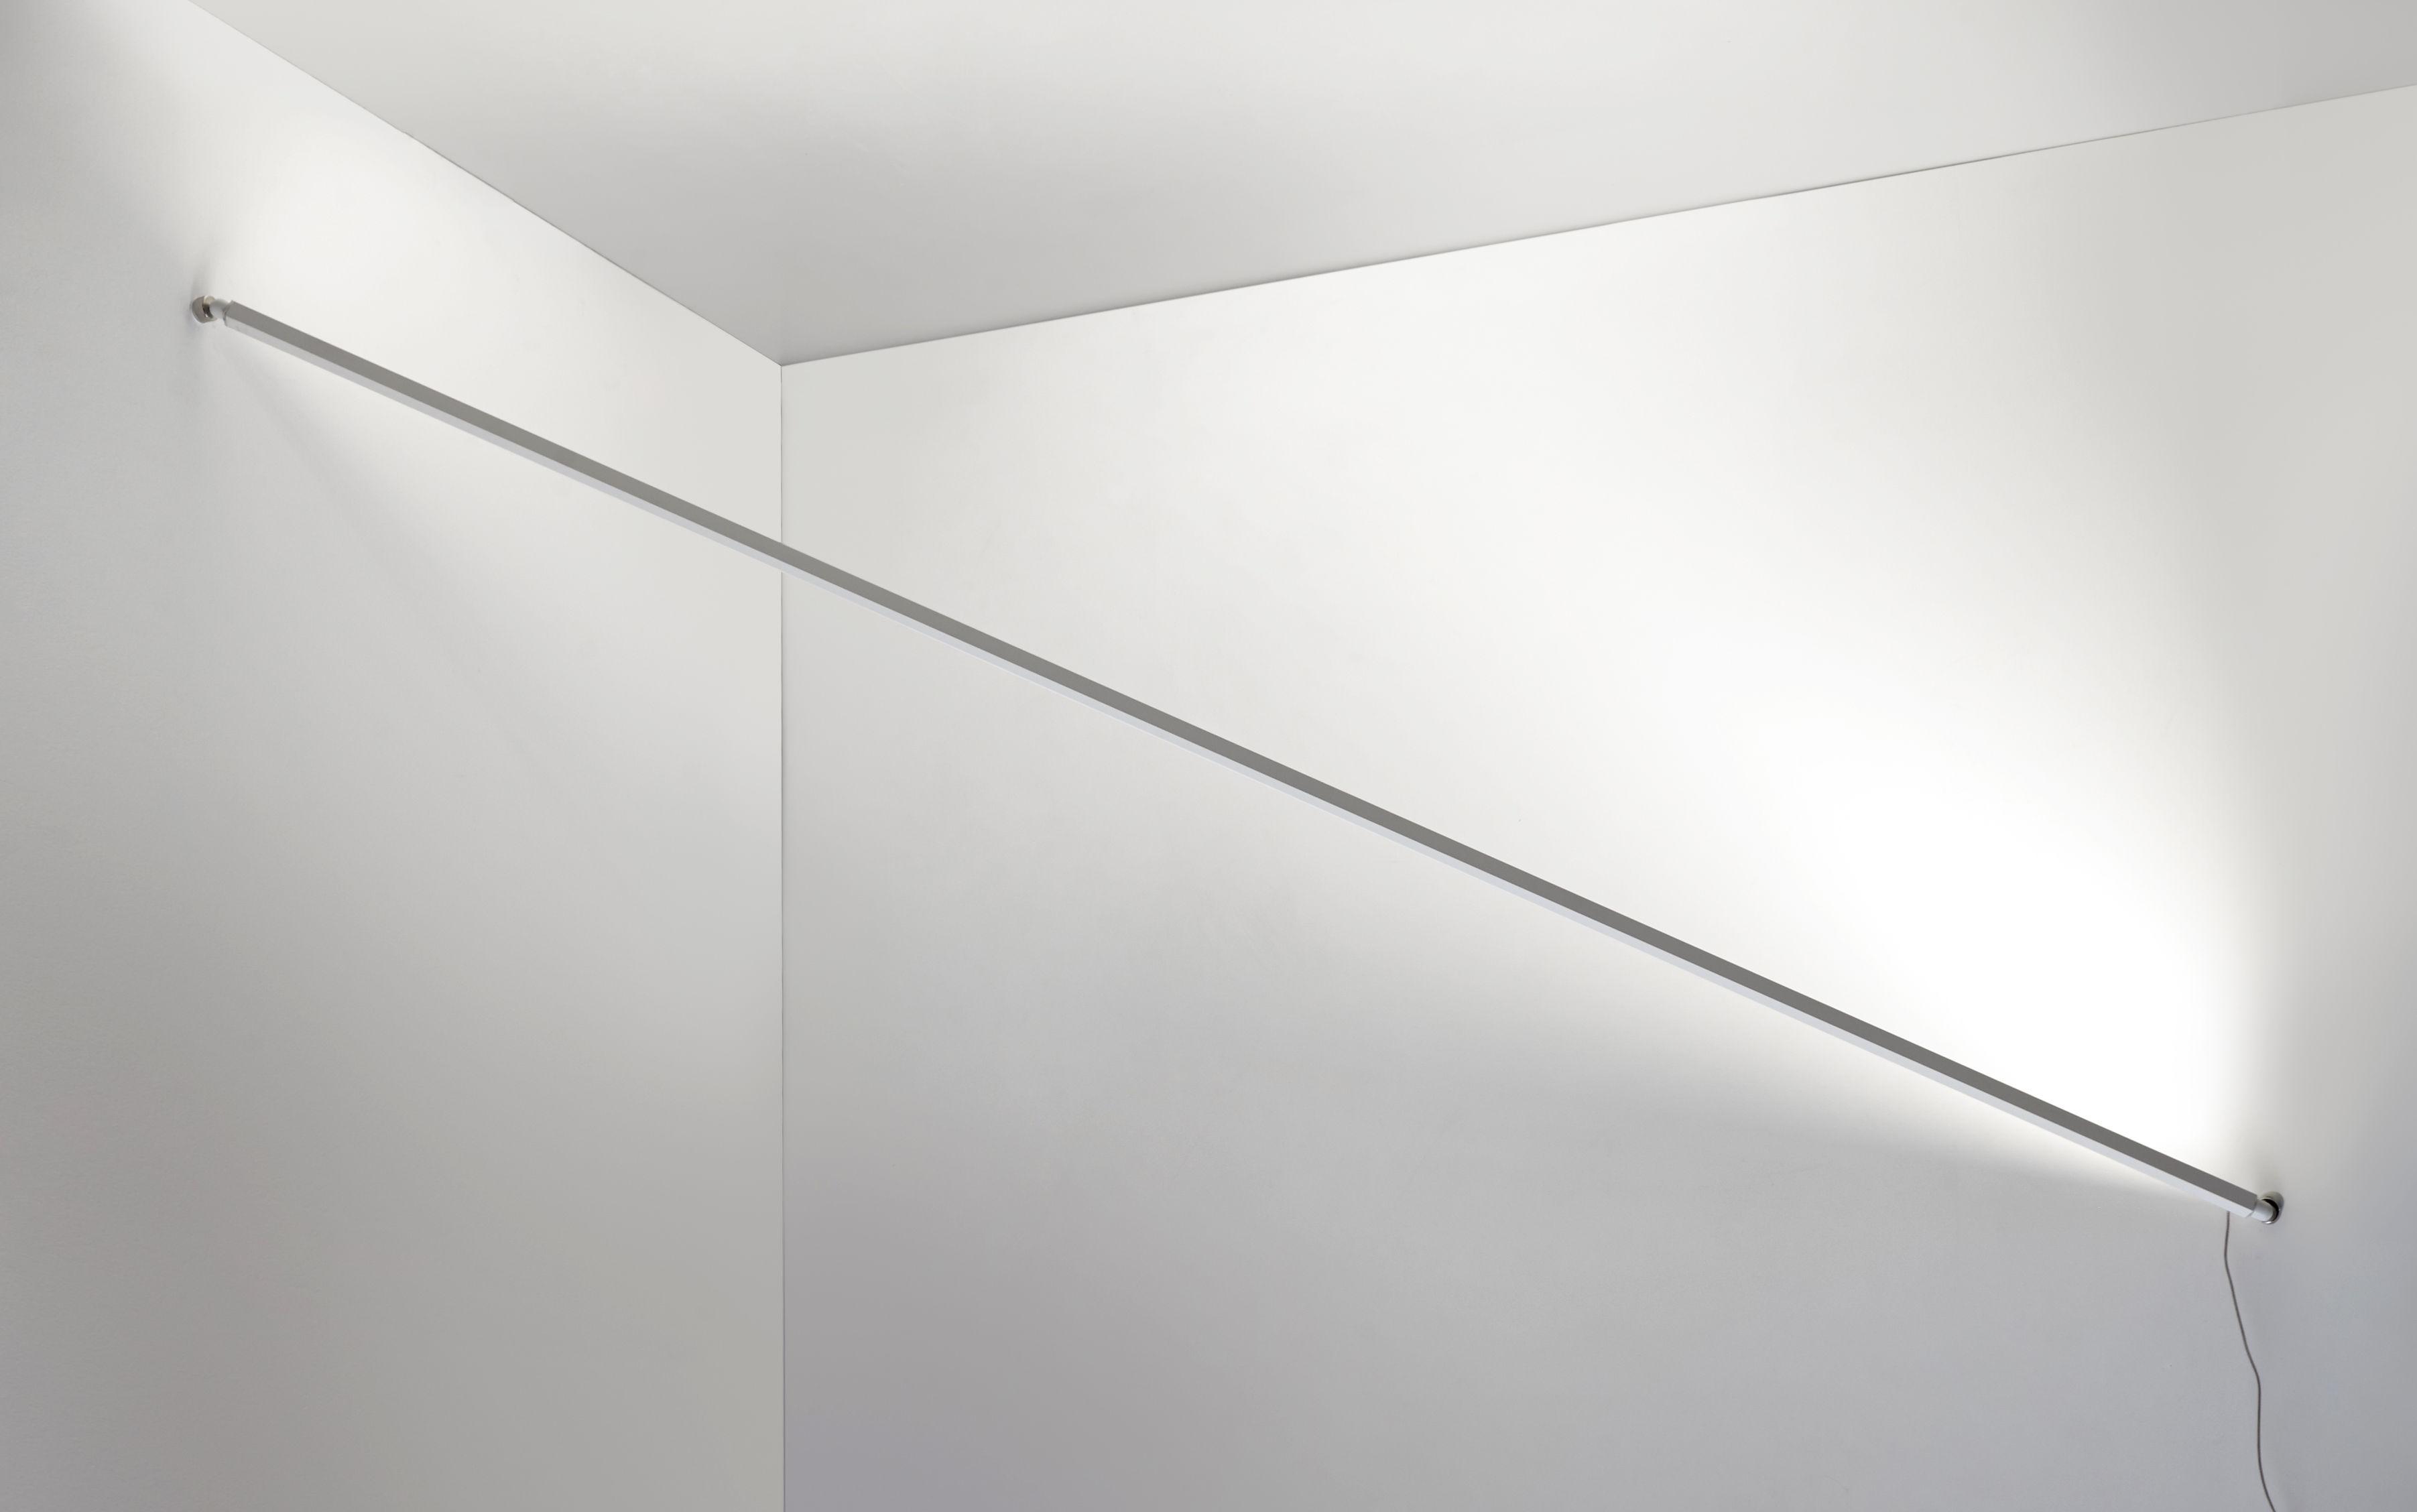 scopri applique flashit led l 150 cm bianco di artemide made in design italia. Black Bedroom Furniture Sets. Home Design Ideas